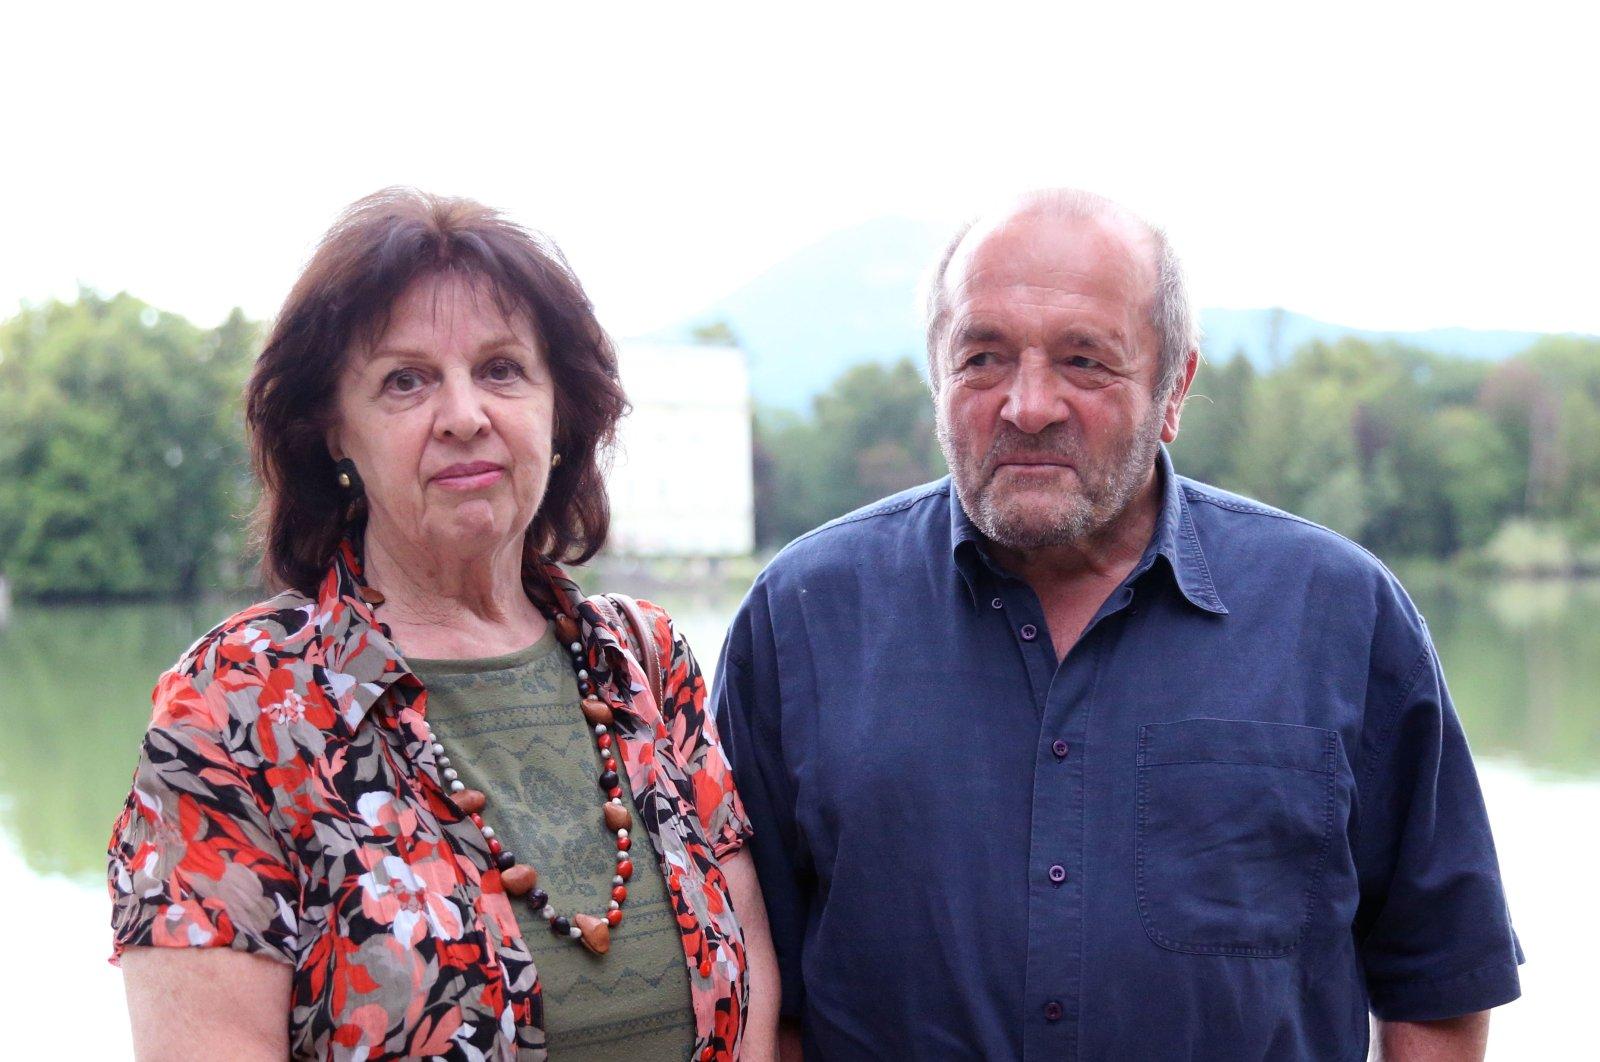 Roland Selim Kadir Osmanoğlu poses with his wife Gerlinde, in Salzburg, Austria, Aug. 4, 2021. (AA PHOTO)